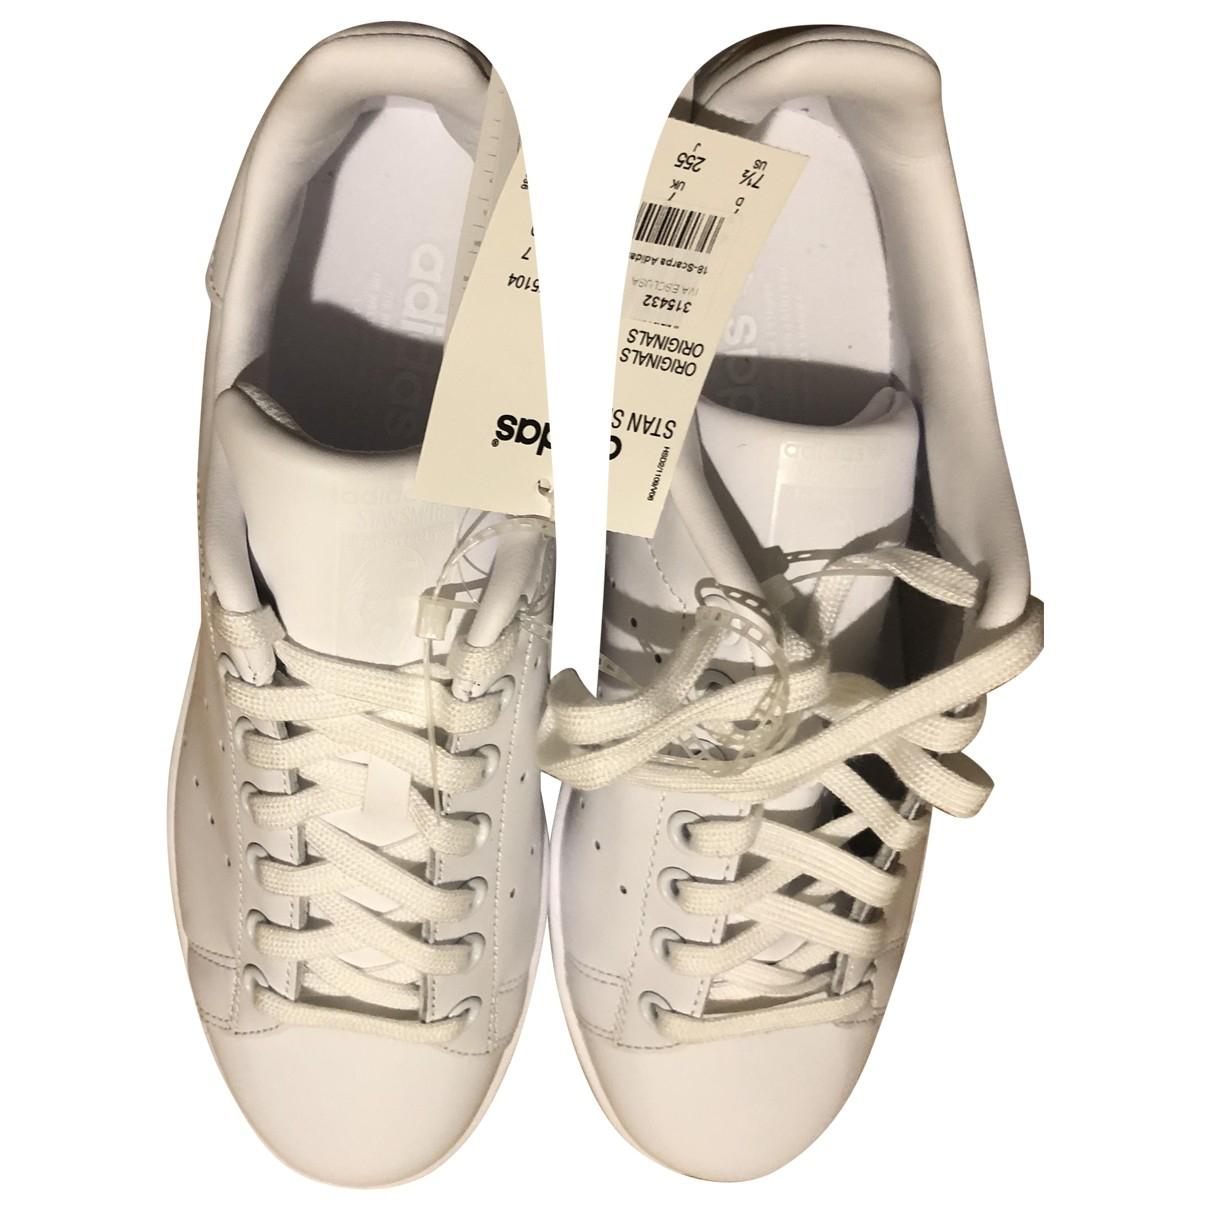 Adidas - Baskets Stan Smith pour femme en cuir - blanc